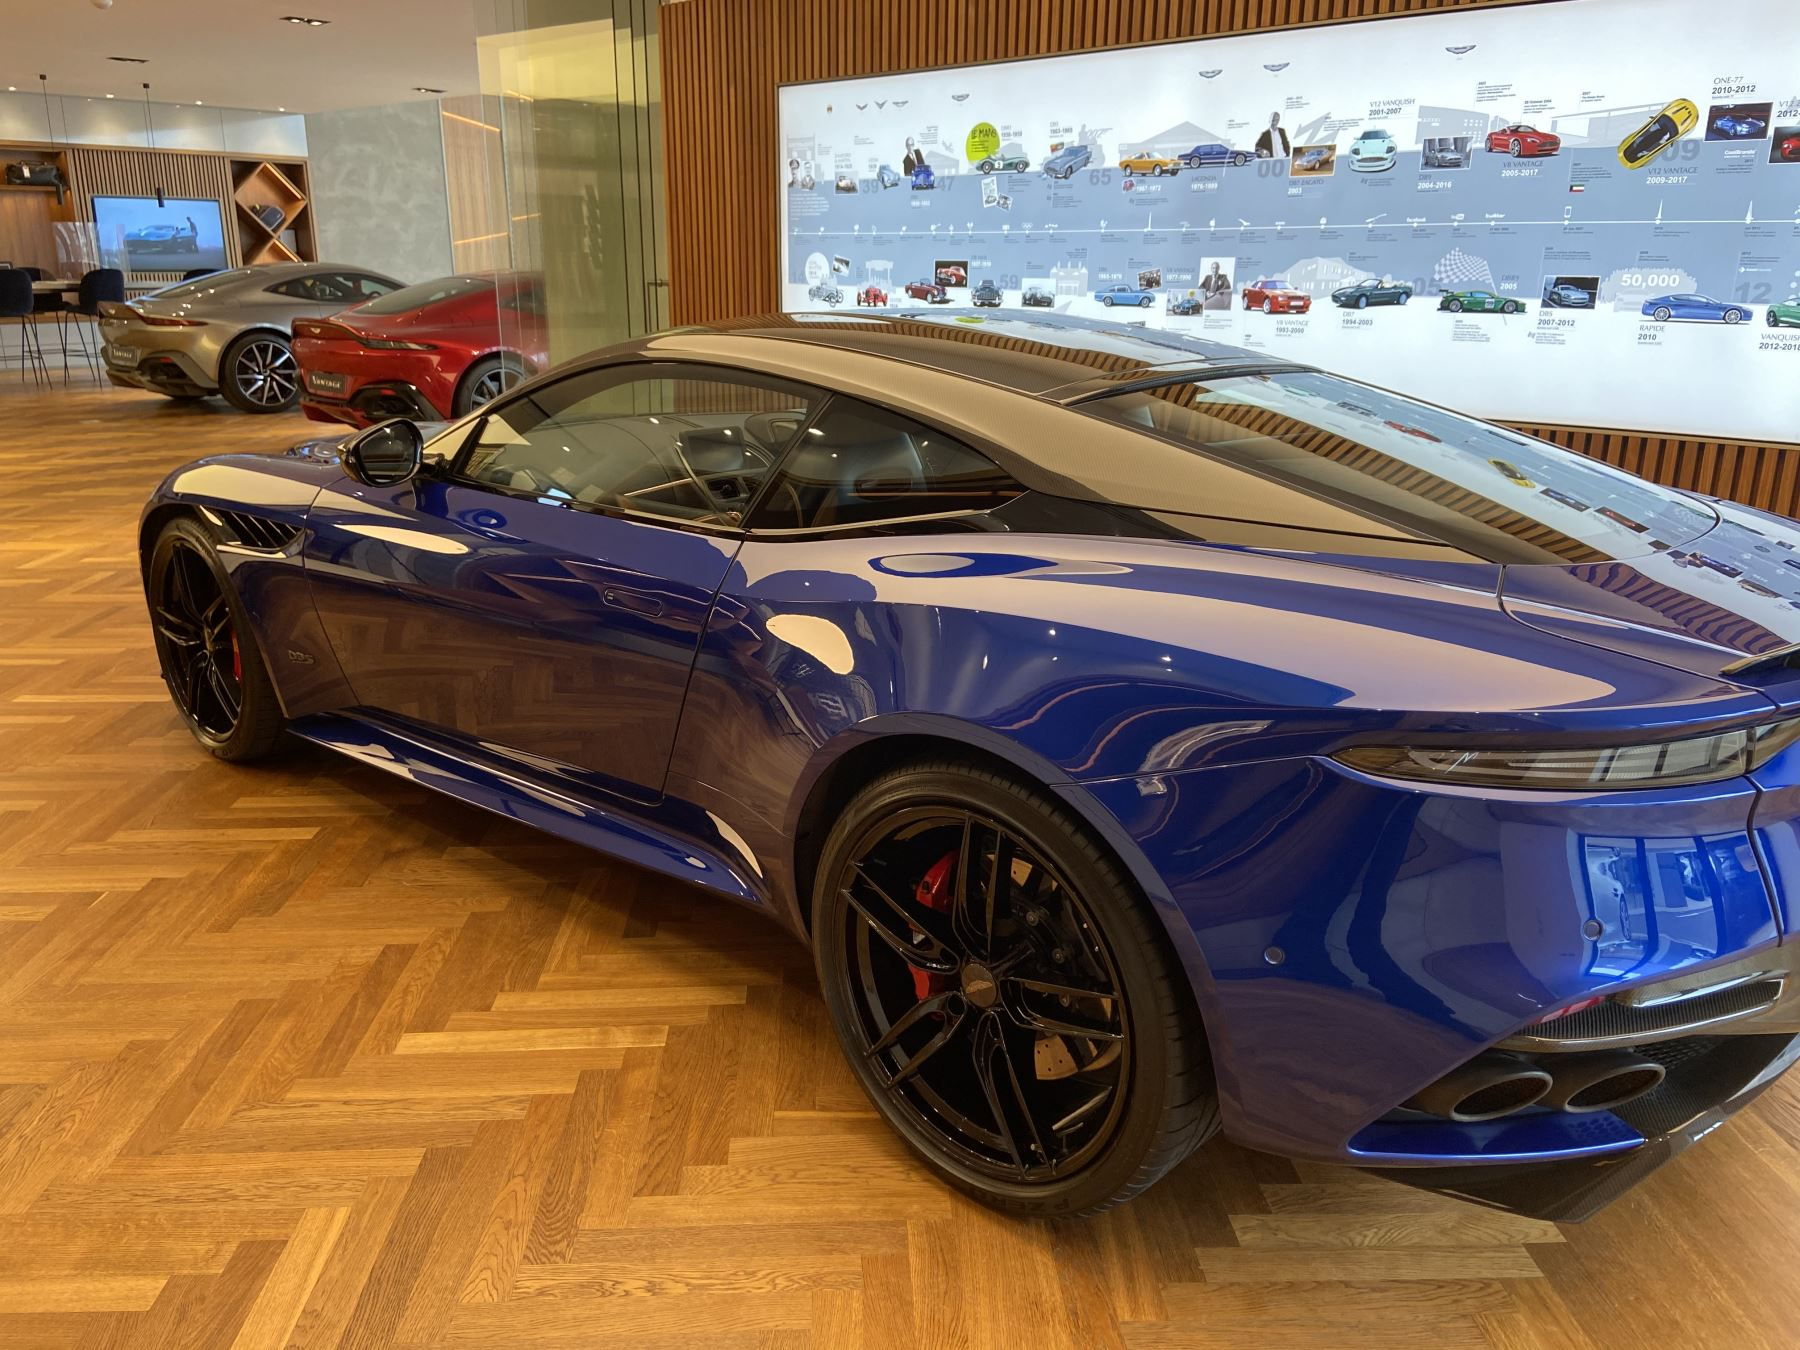 Aston Martin DBS V12 Superleggera 2dr Touchtronic image 4